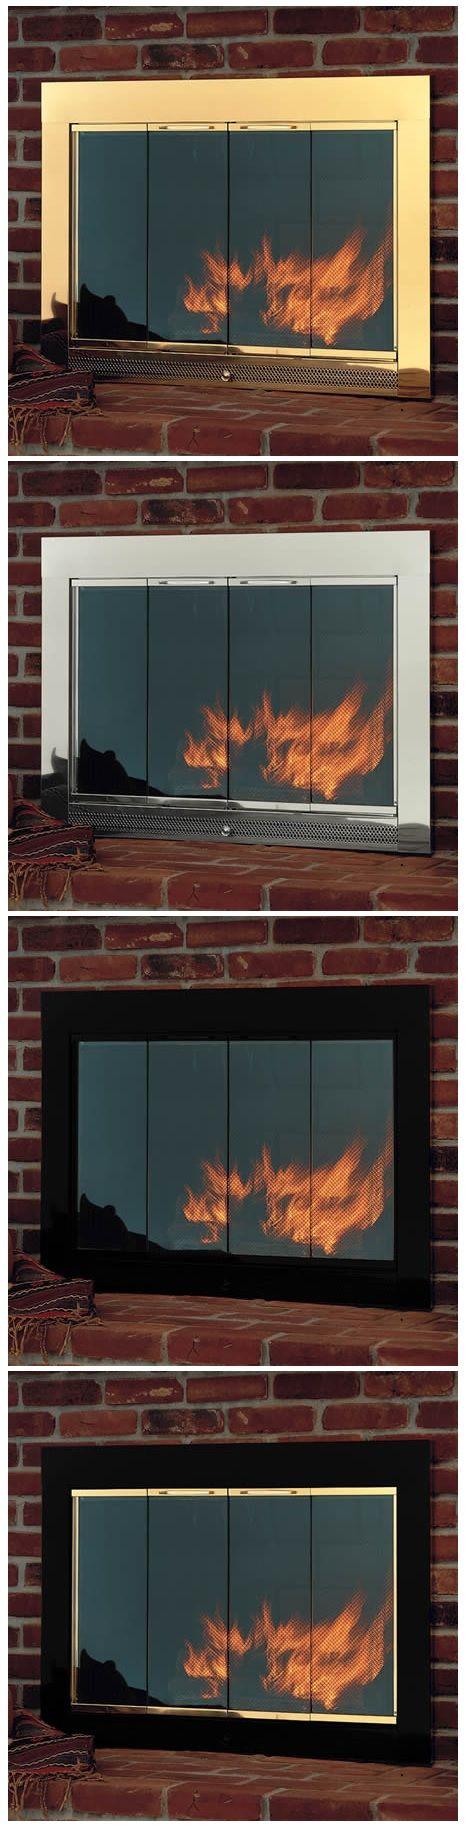 Slimline Fireplace Glass Doors